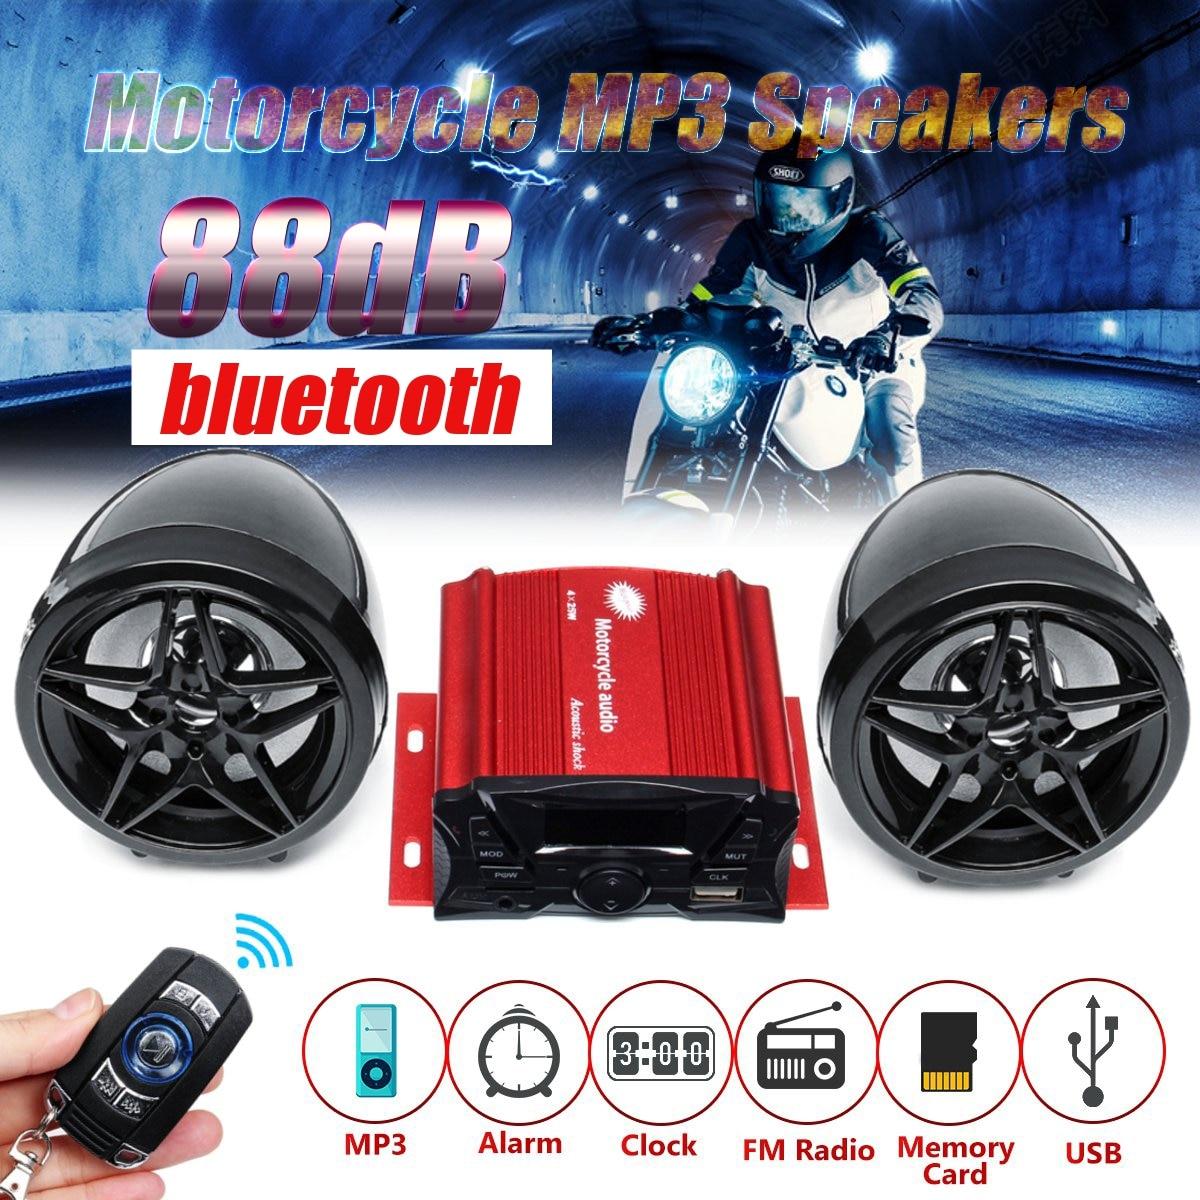 Anti-theft 88dB Motorcycle Audio MP3 Player Wireless Remote Control Alarm Clock FM USB Bluetooth Speaker Music Player